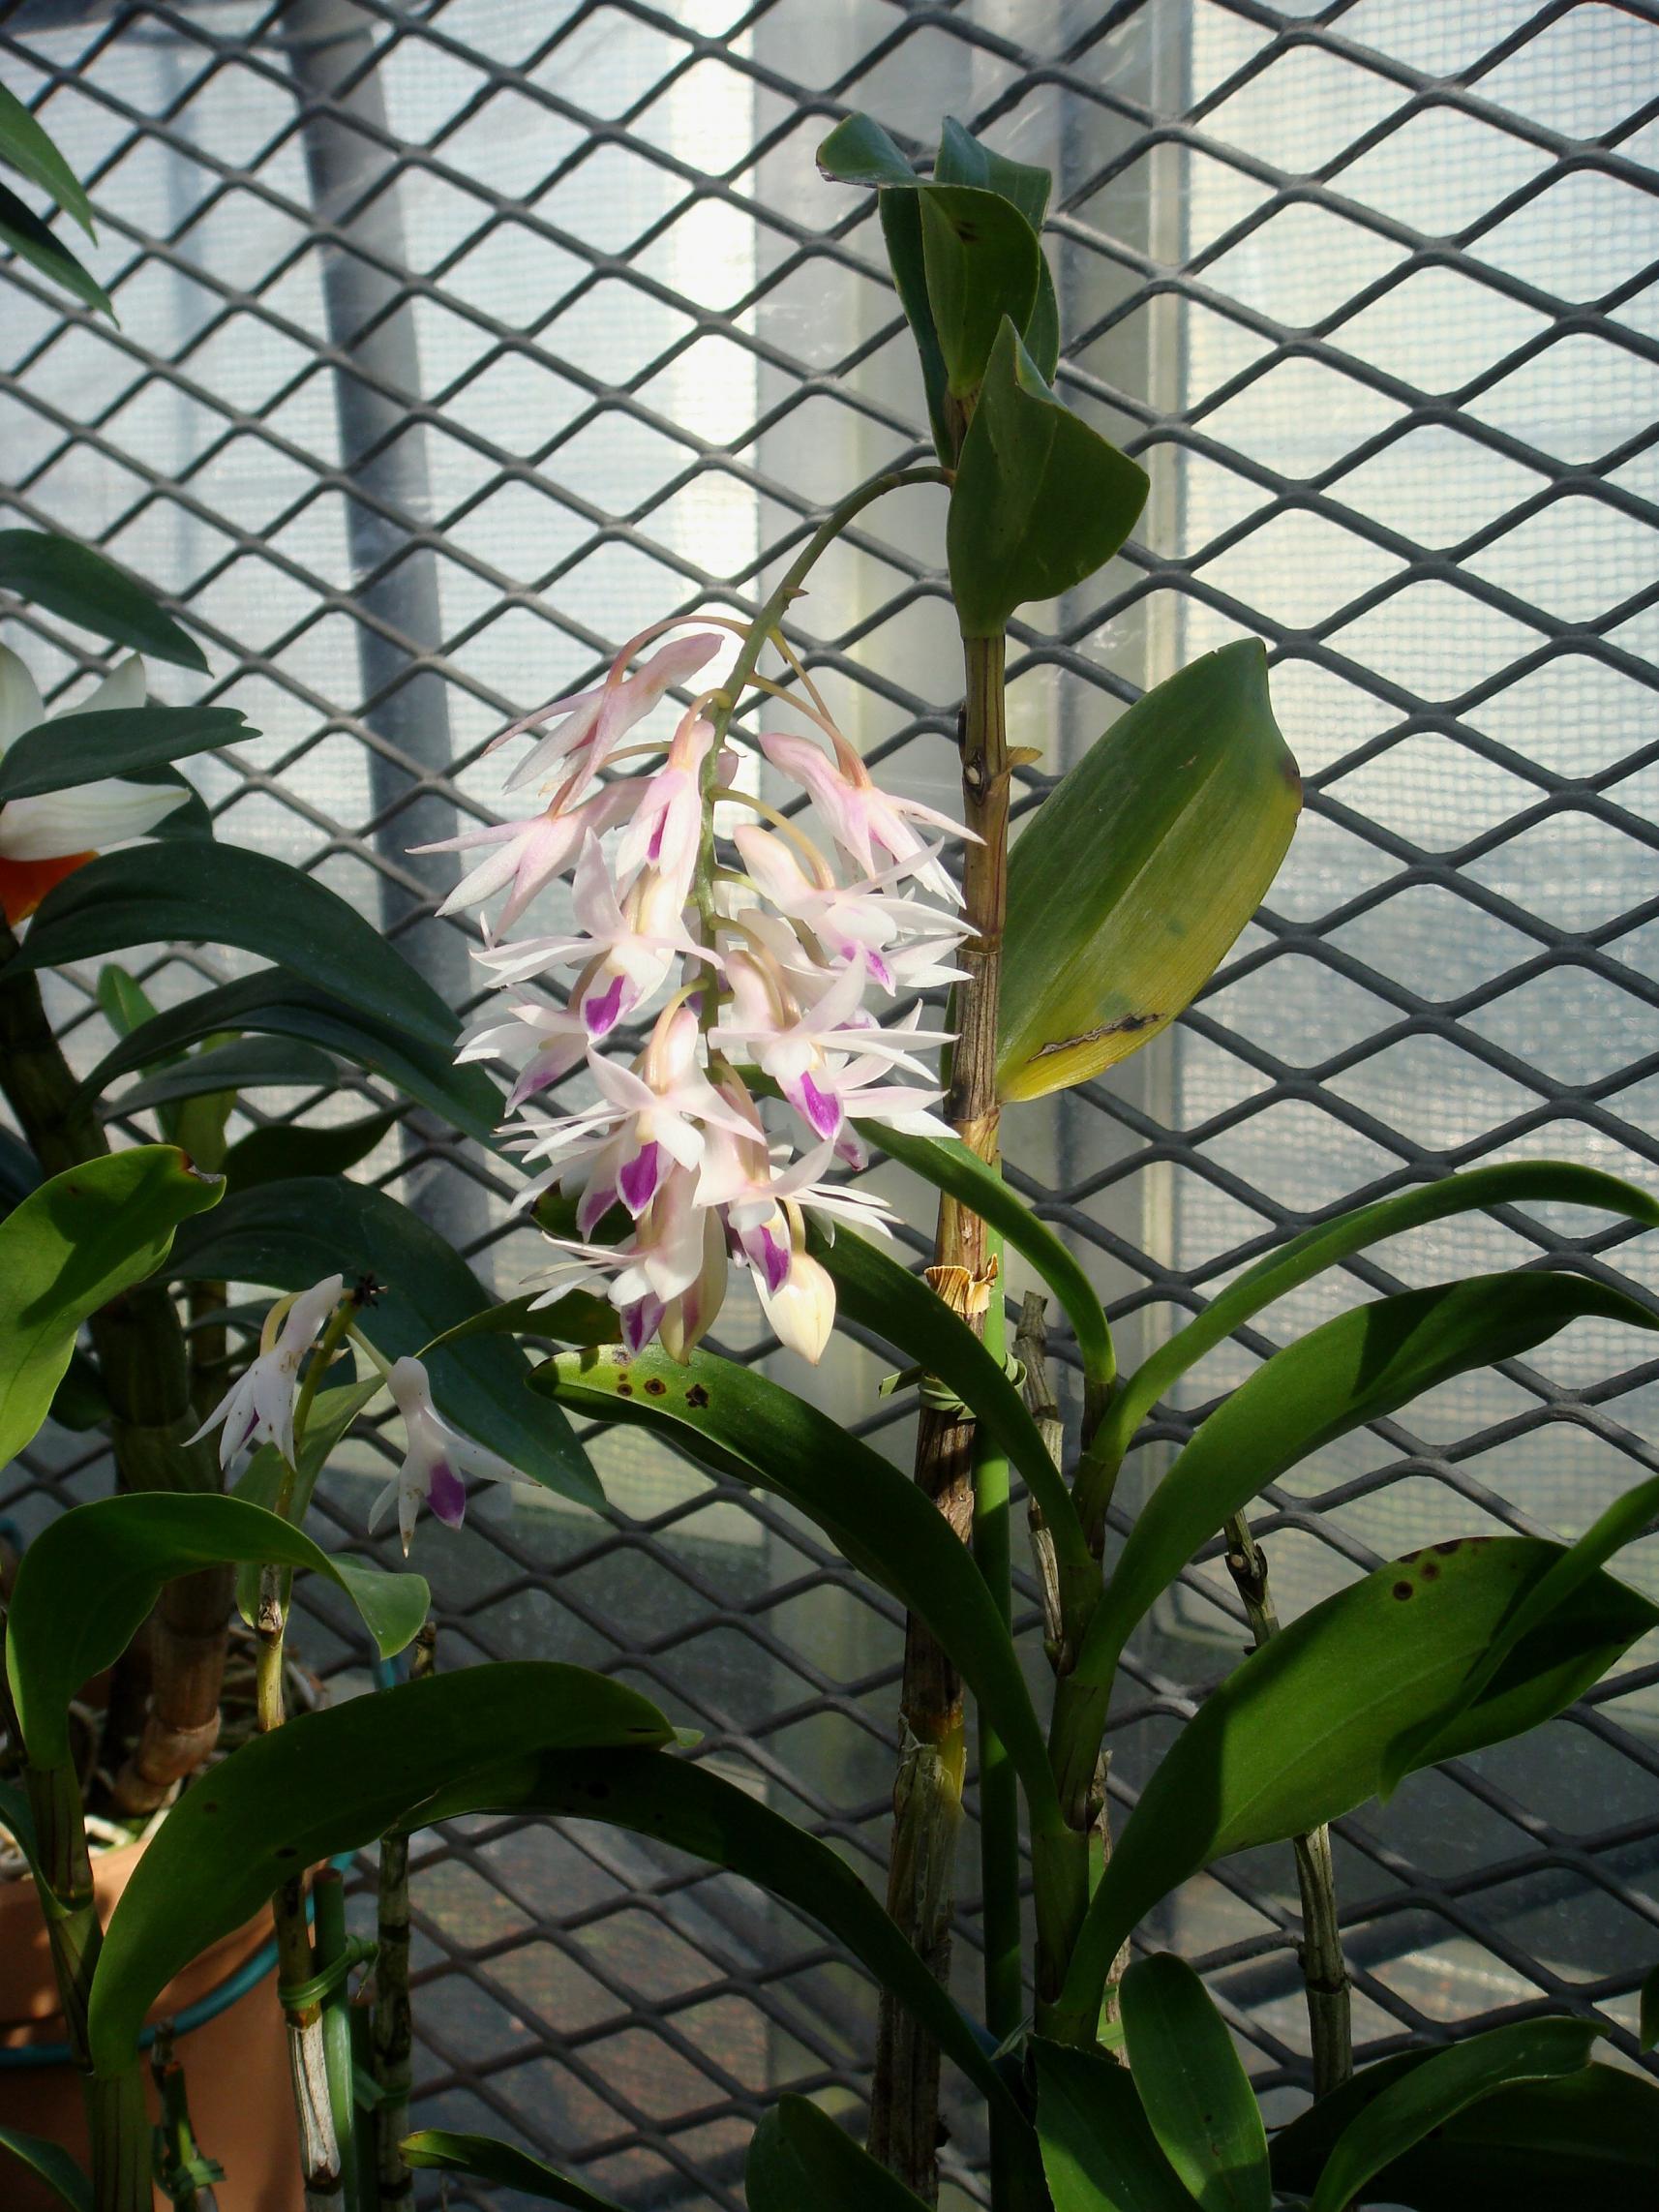 http://orchids.la.coocan.jp/Dendrobium/Dendrobium%20amethystoglossum/DSC05535.JPG